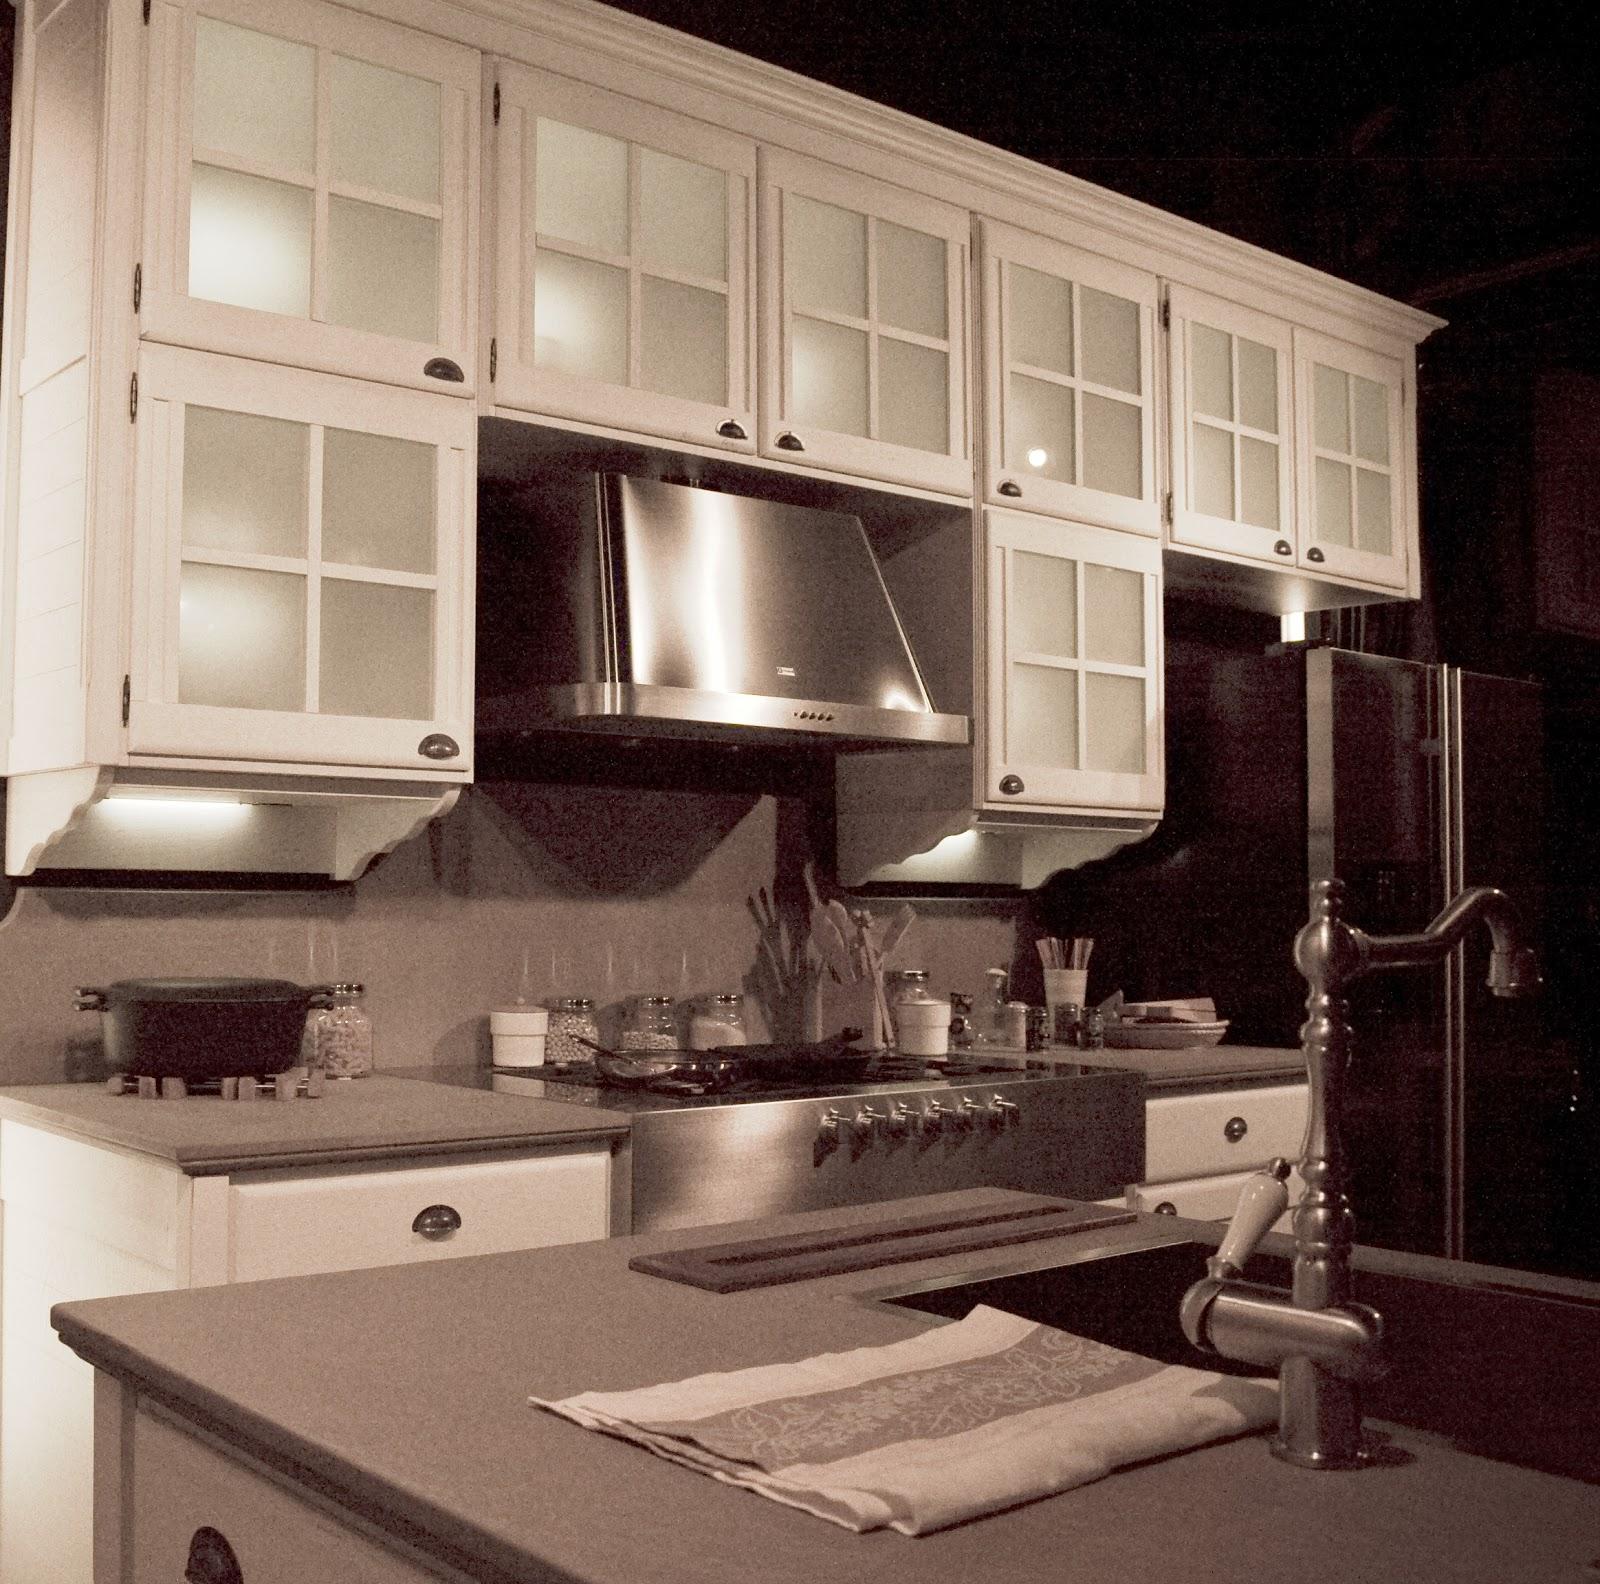 Cucine coloniali elegant mobili coloniali mobili etnici - Cucina coloniale ...